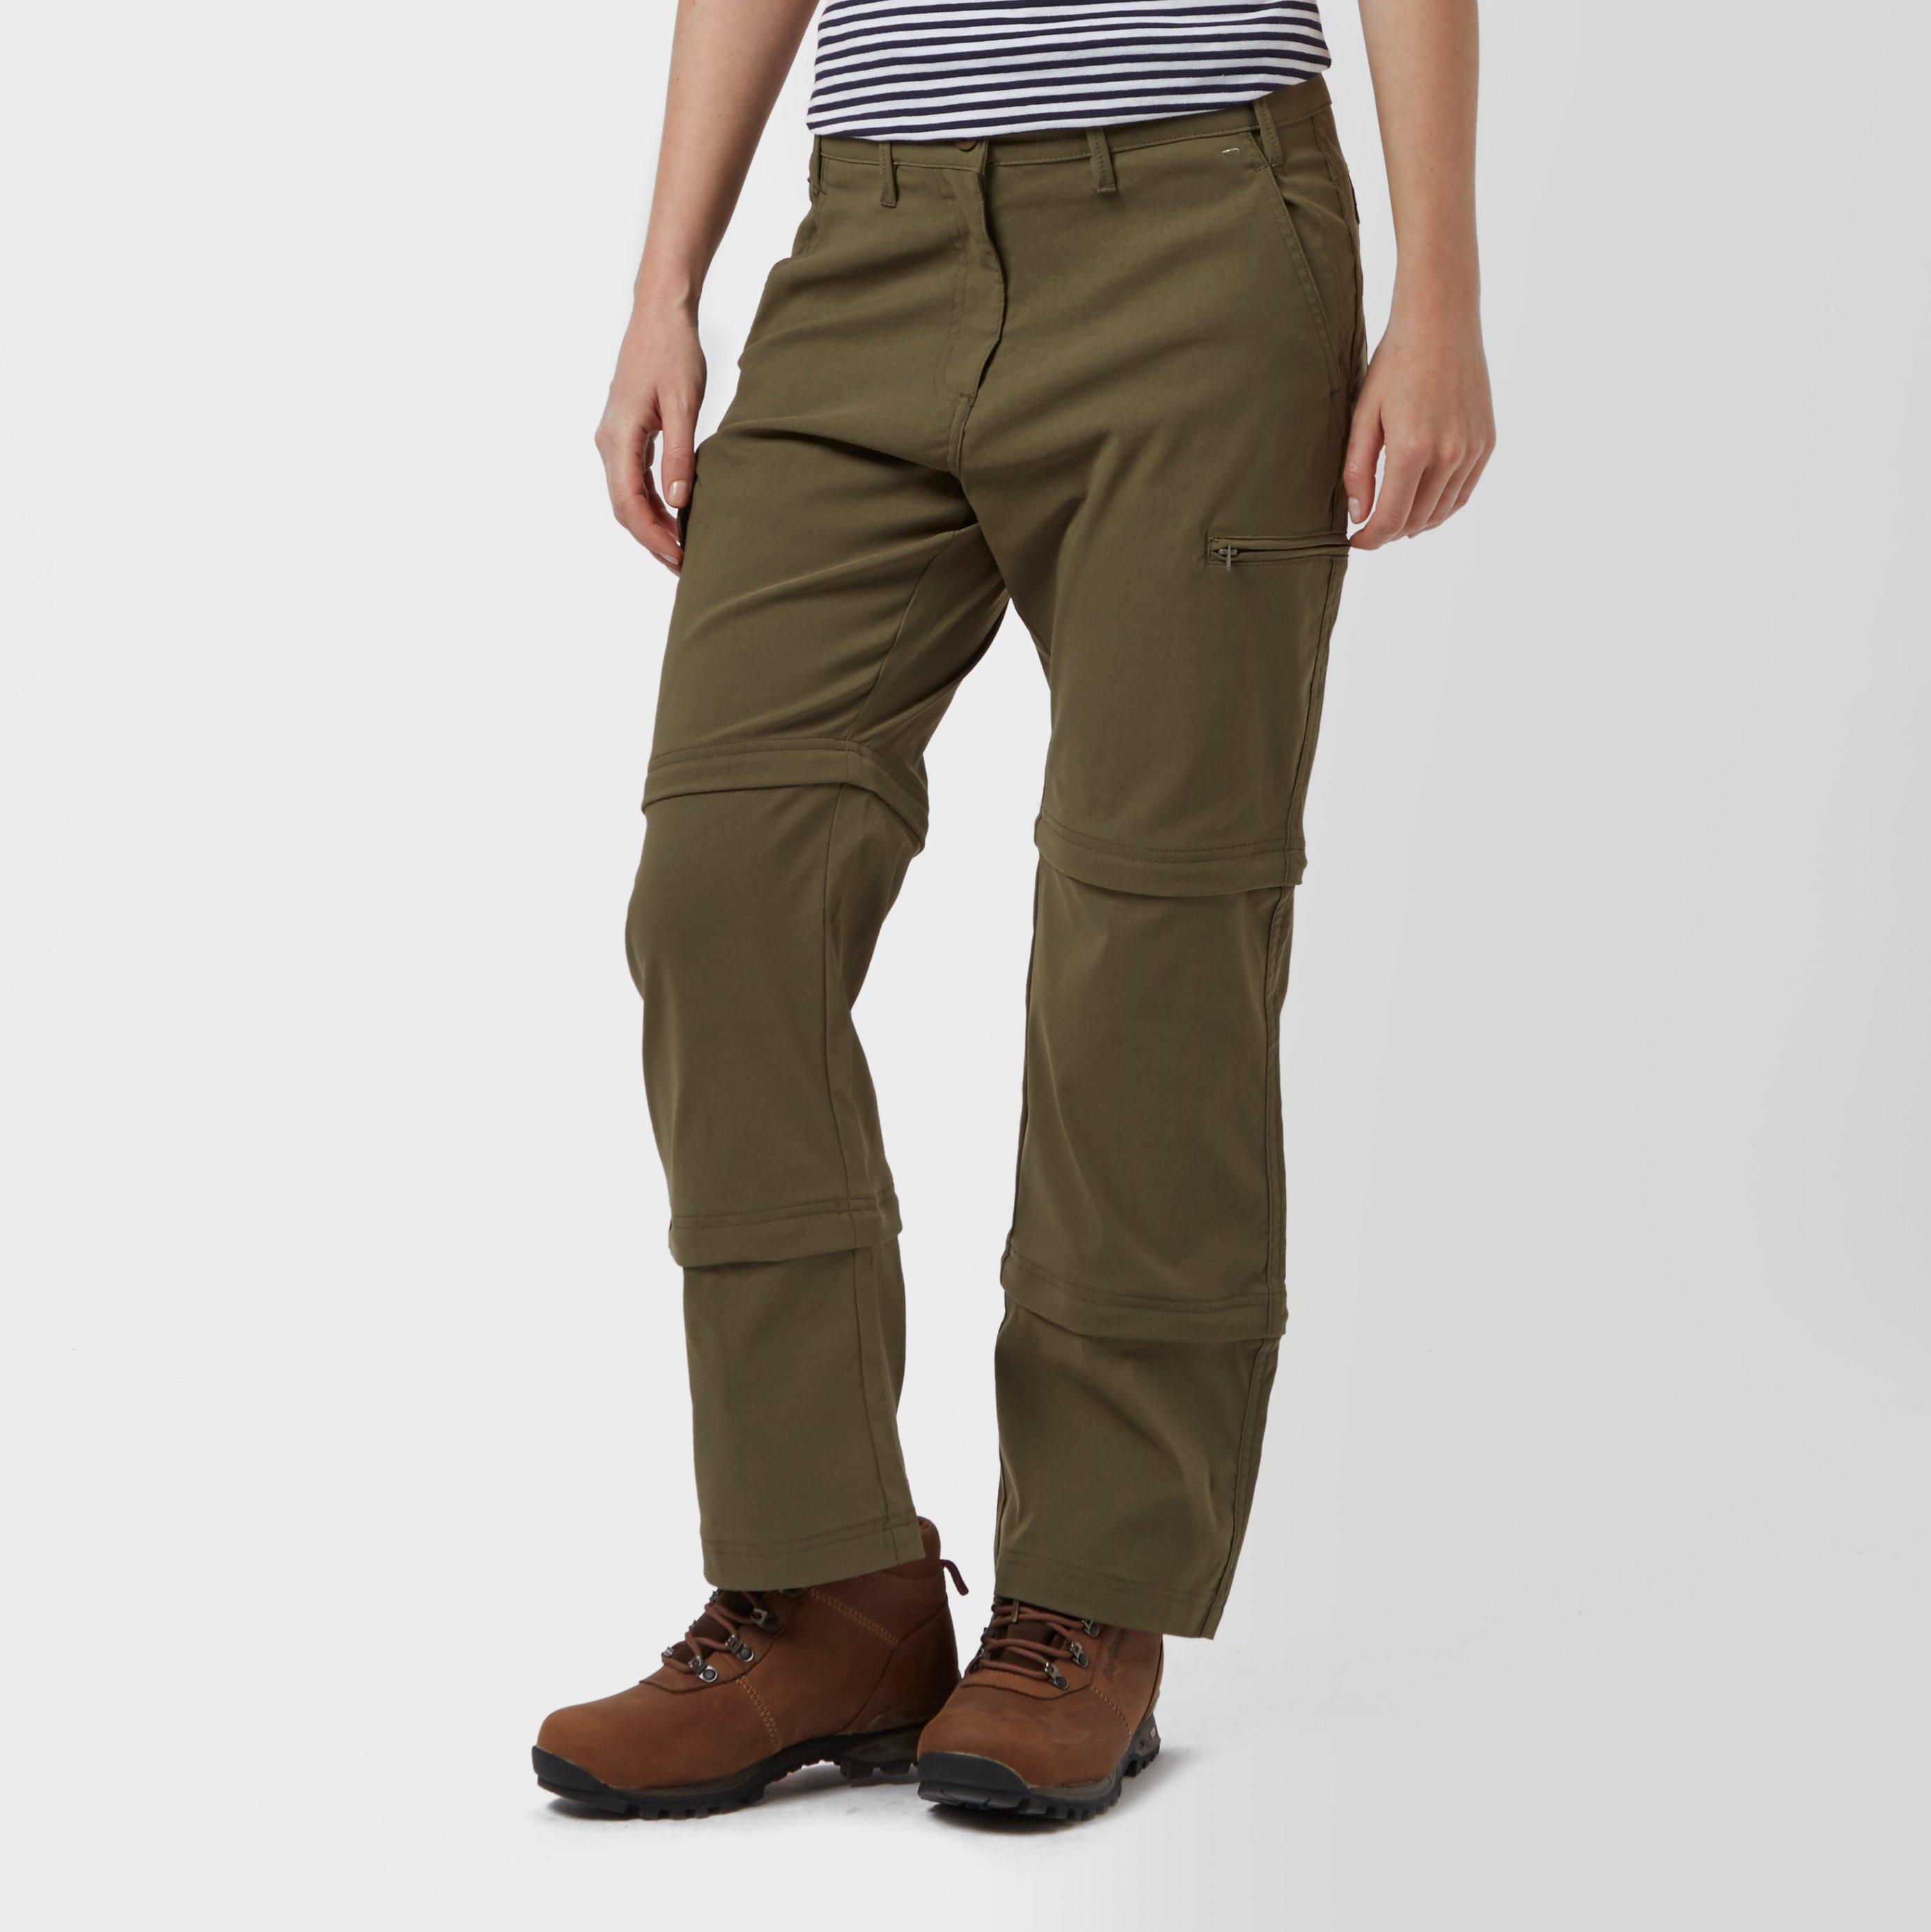 Peter Storm Peter Storm womens Stretch Double Zip Off Trousers - Short - Khaki, Khaki